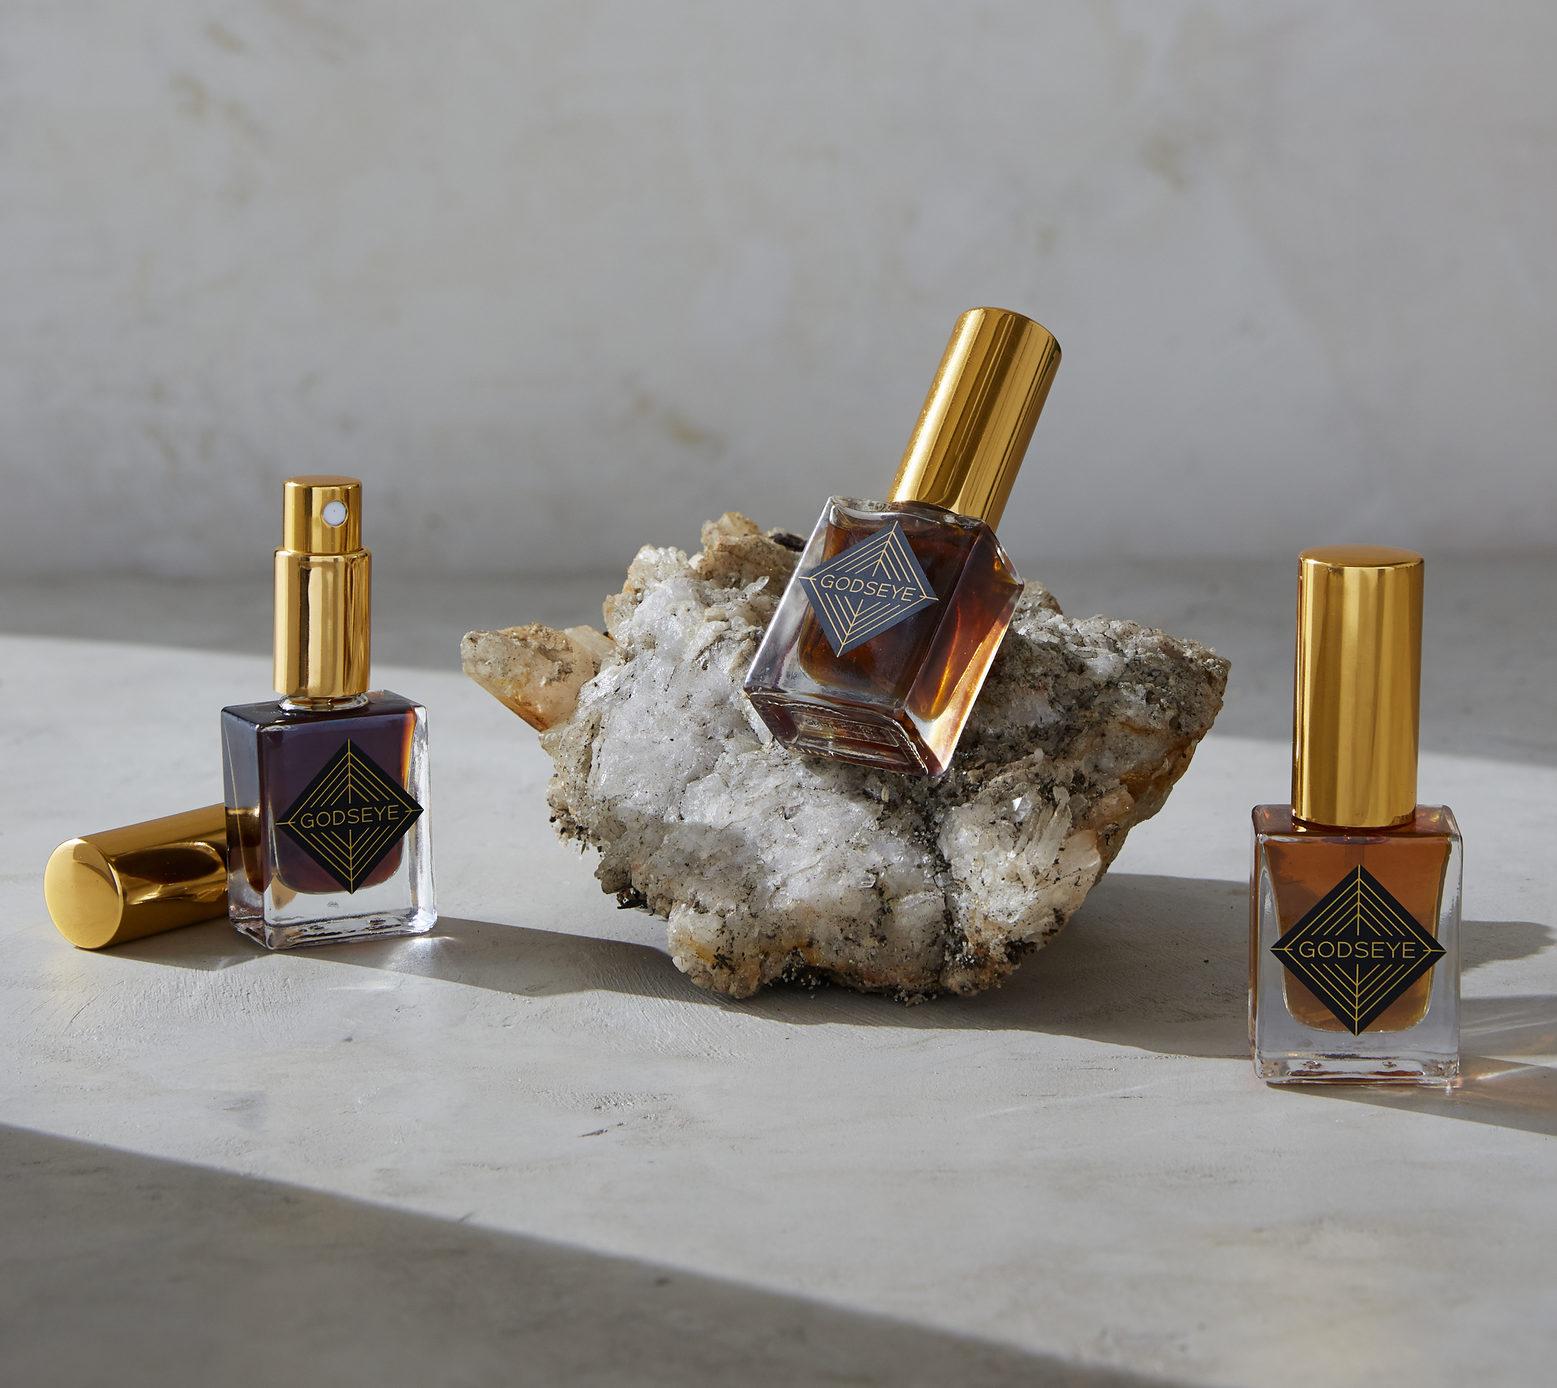 Godseye Oils Perfumes